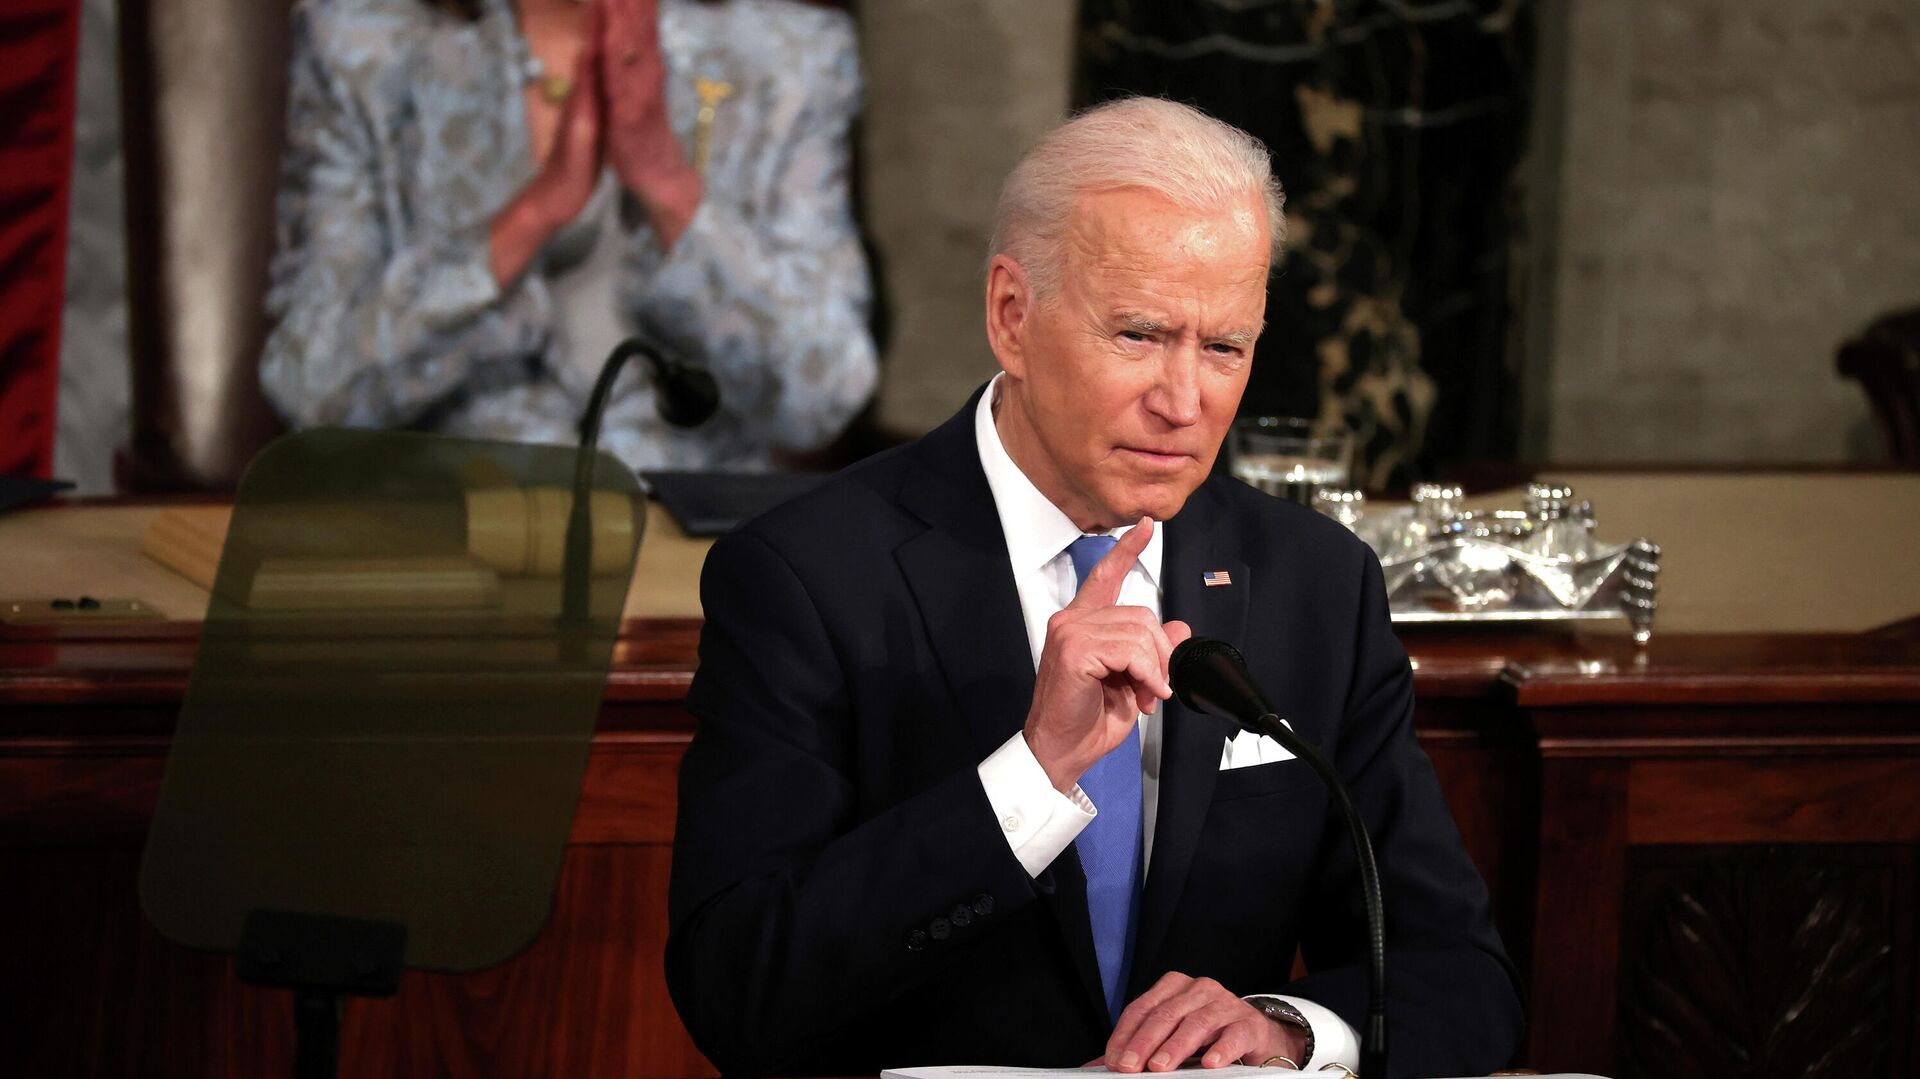 Joe Biden, presidente de EEUU - Sputnik Mundo, 1920, 07.05.2021